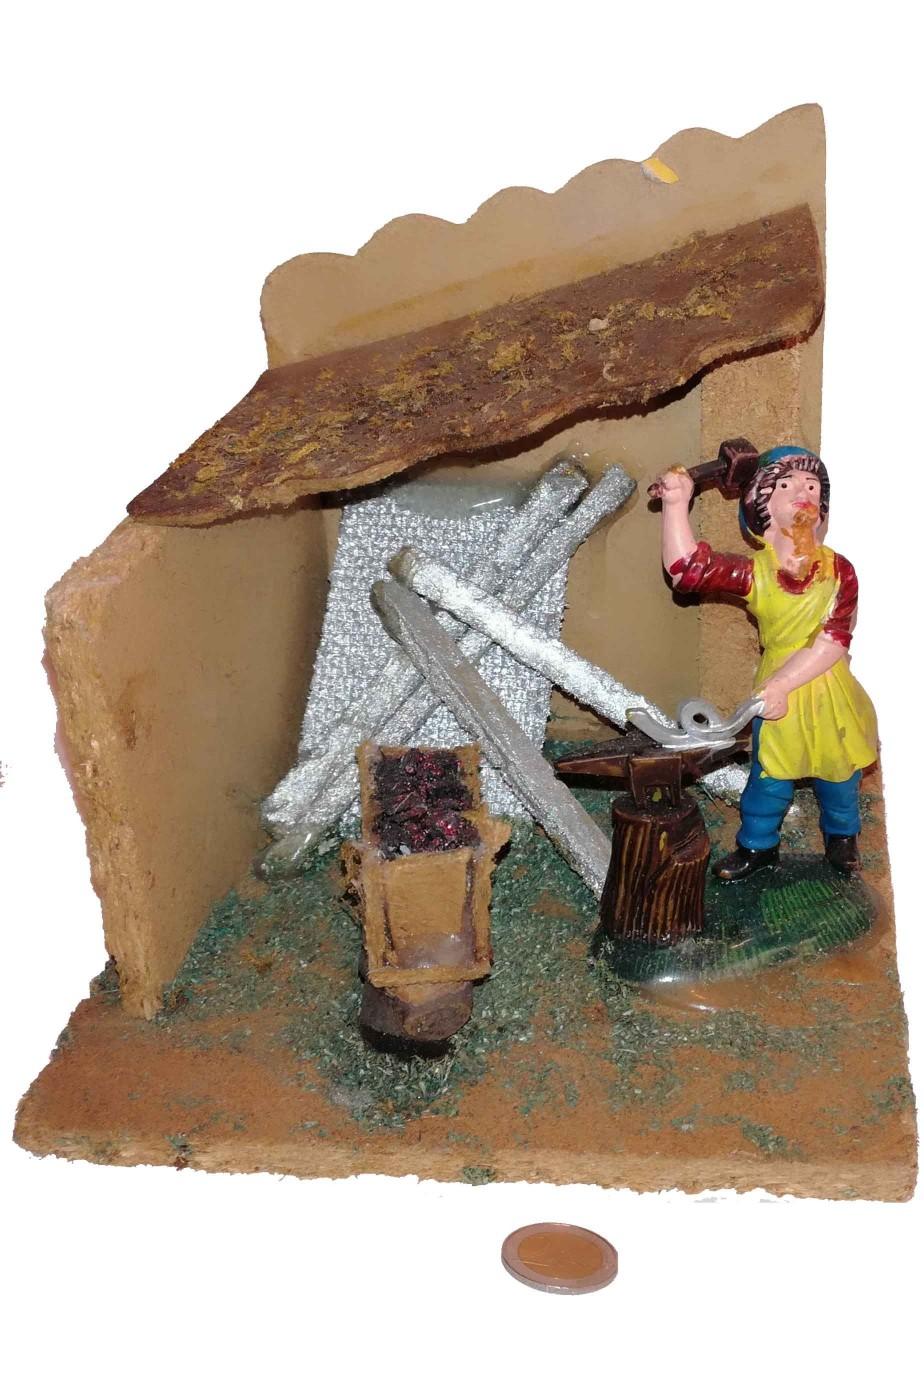 Figurina Presepe in plastica (cm 7 o 10 s.q.) Fabbro